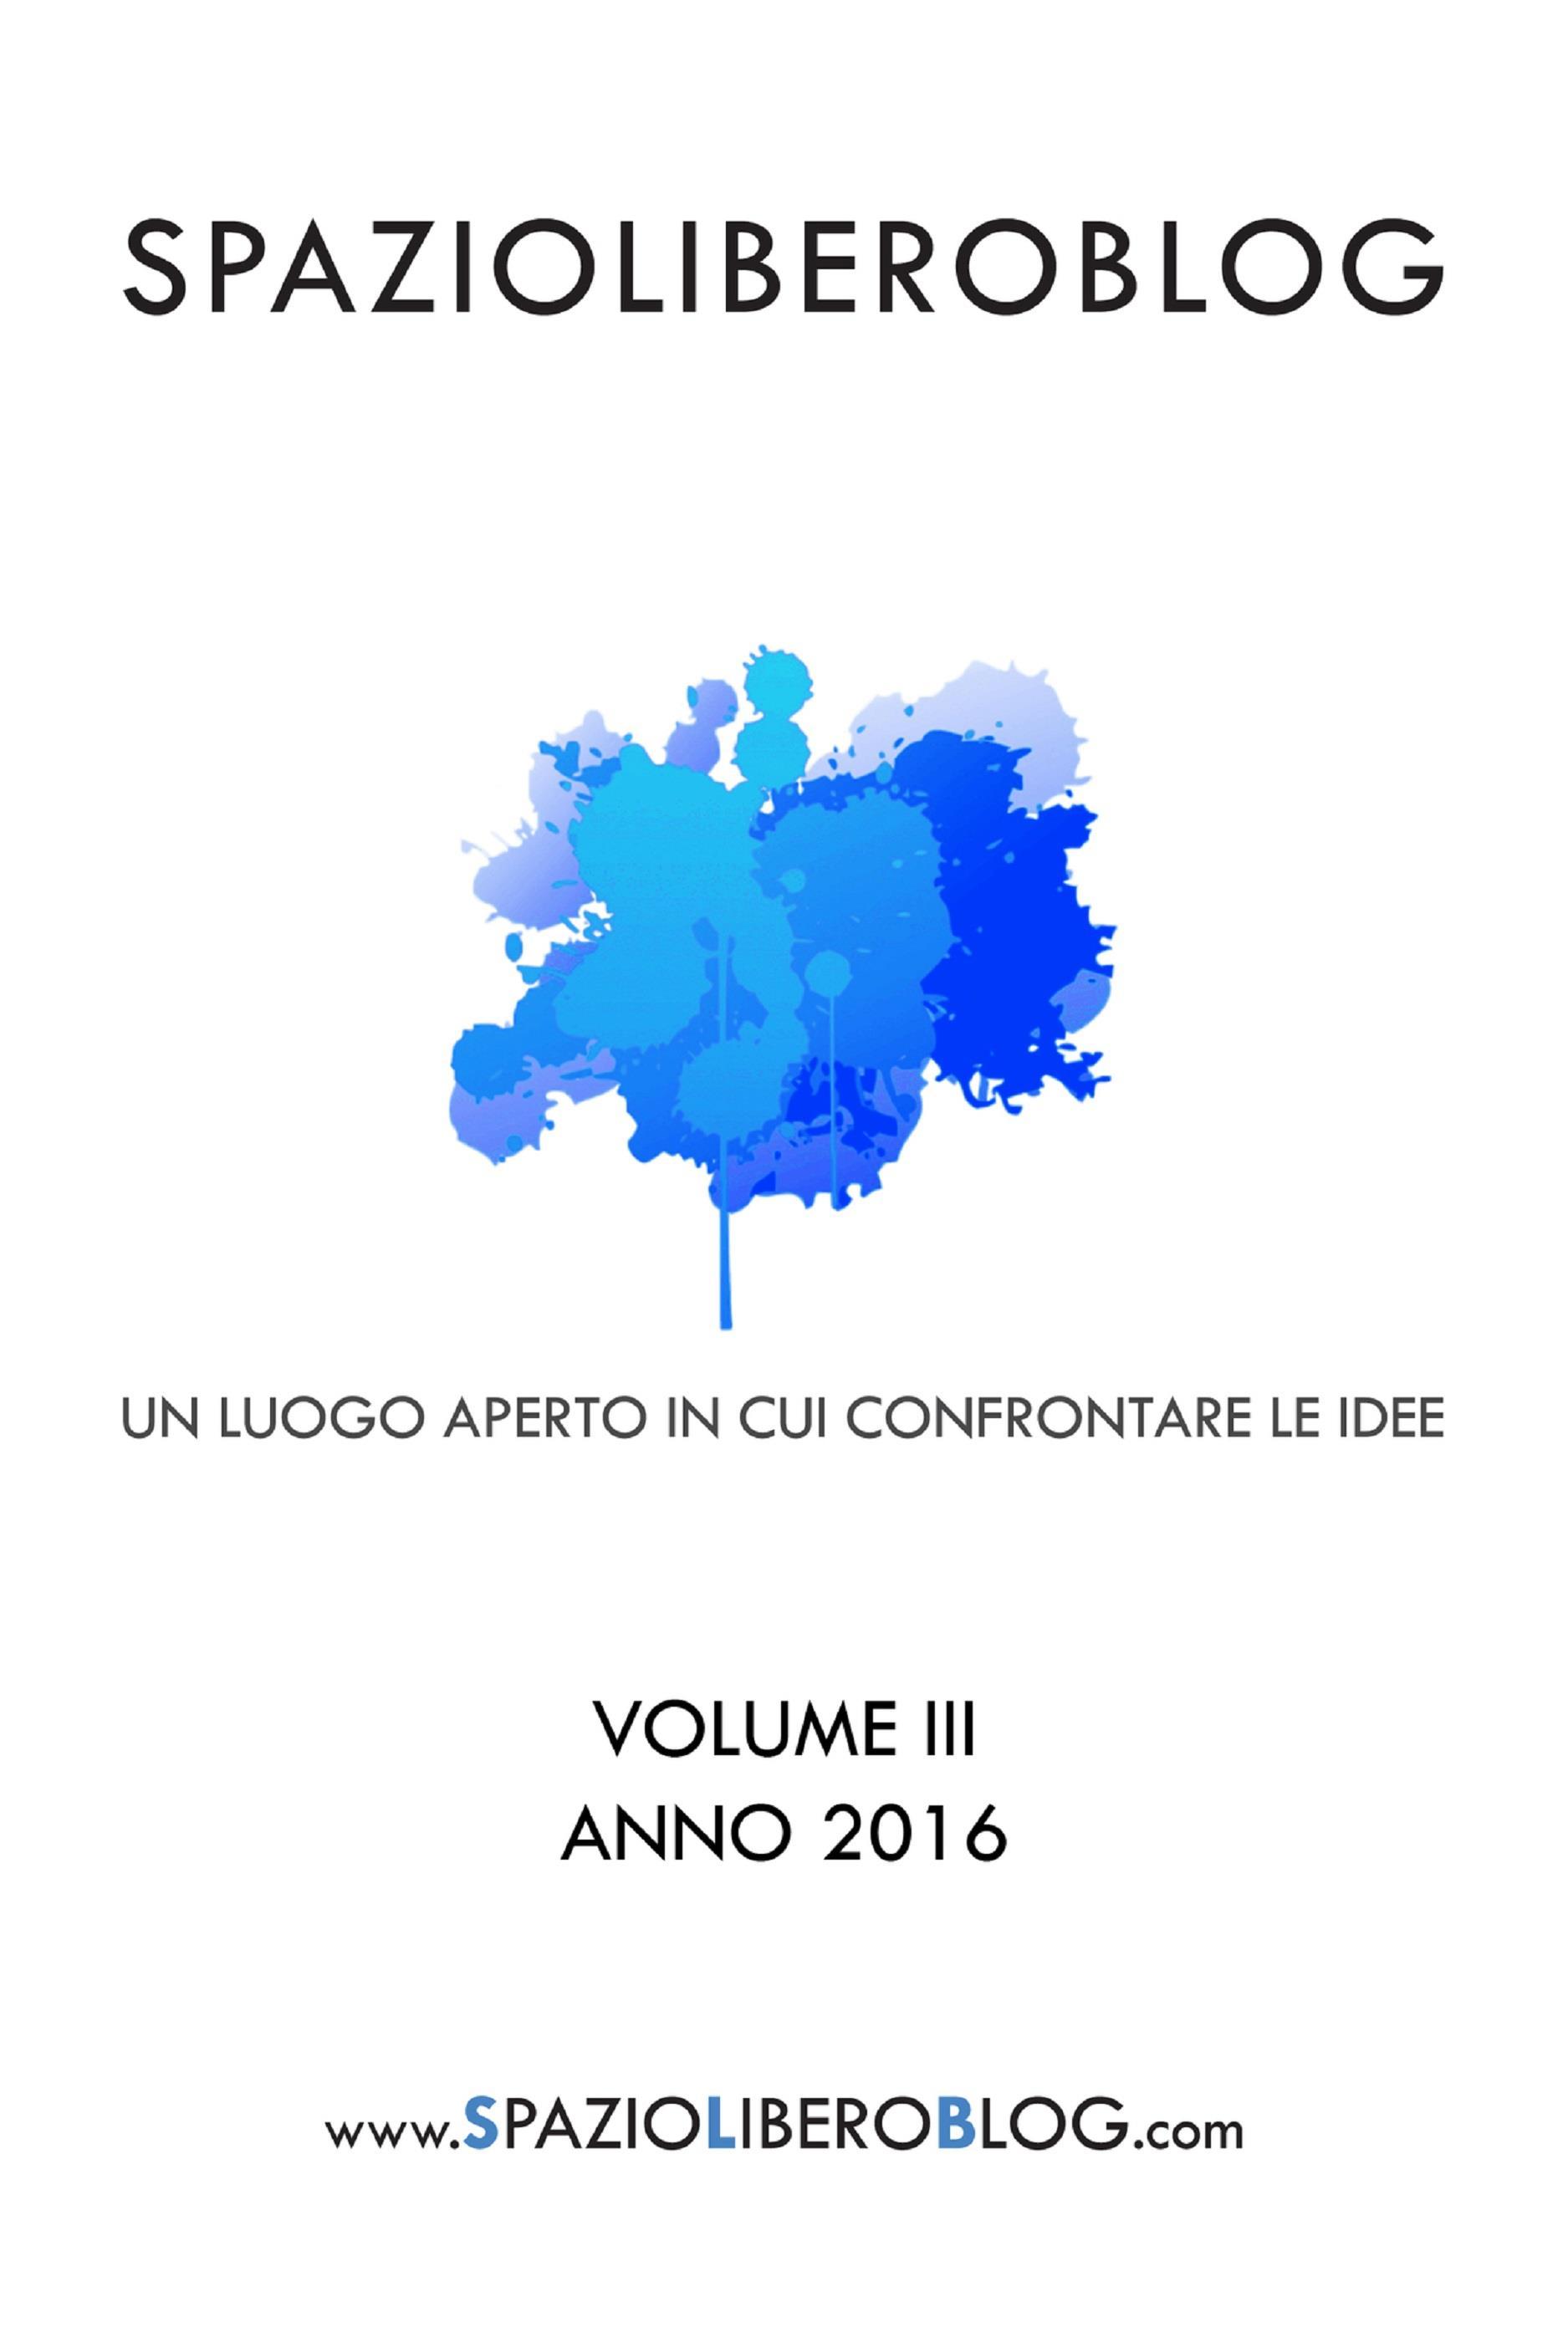 Spazioliberoblog - Volume 3